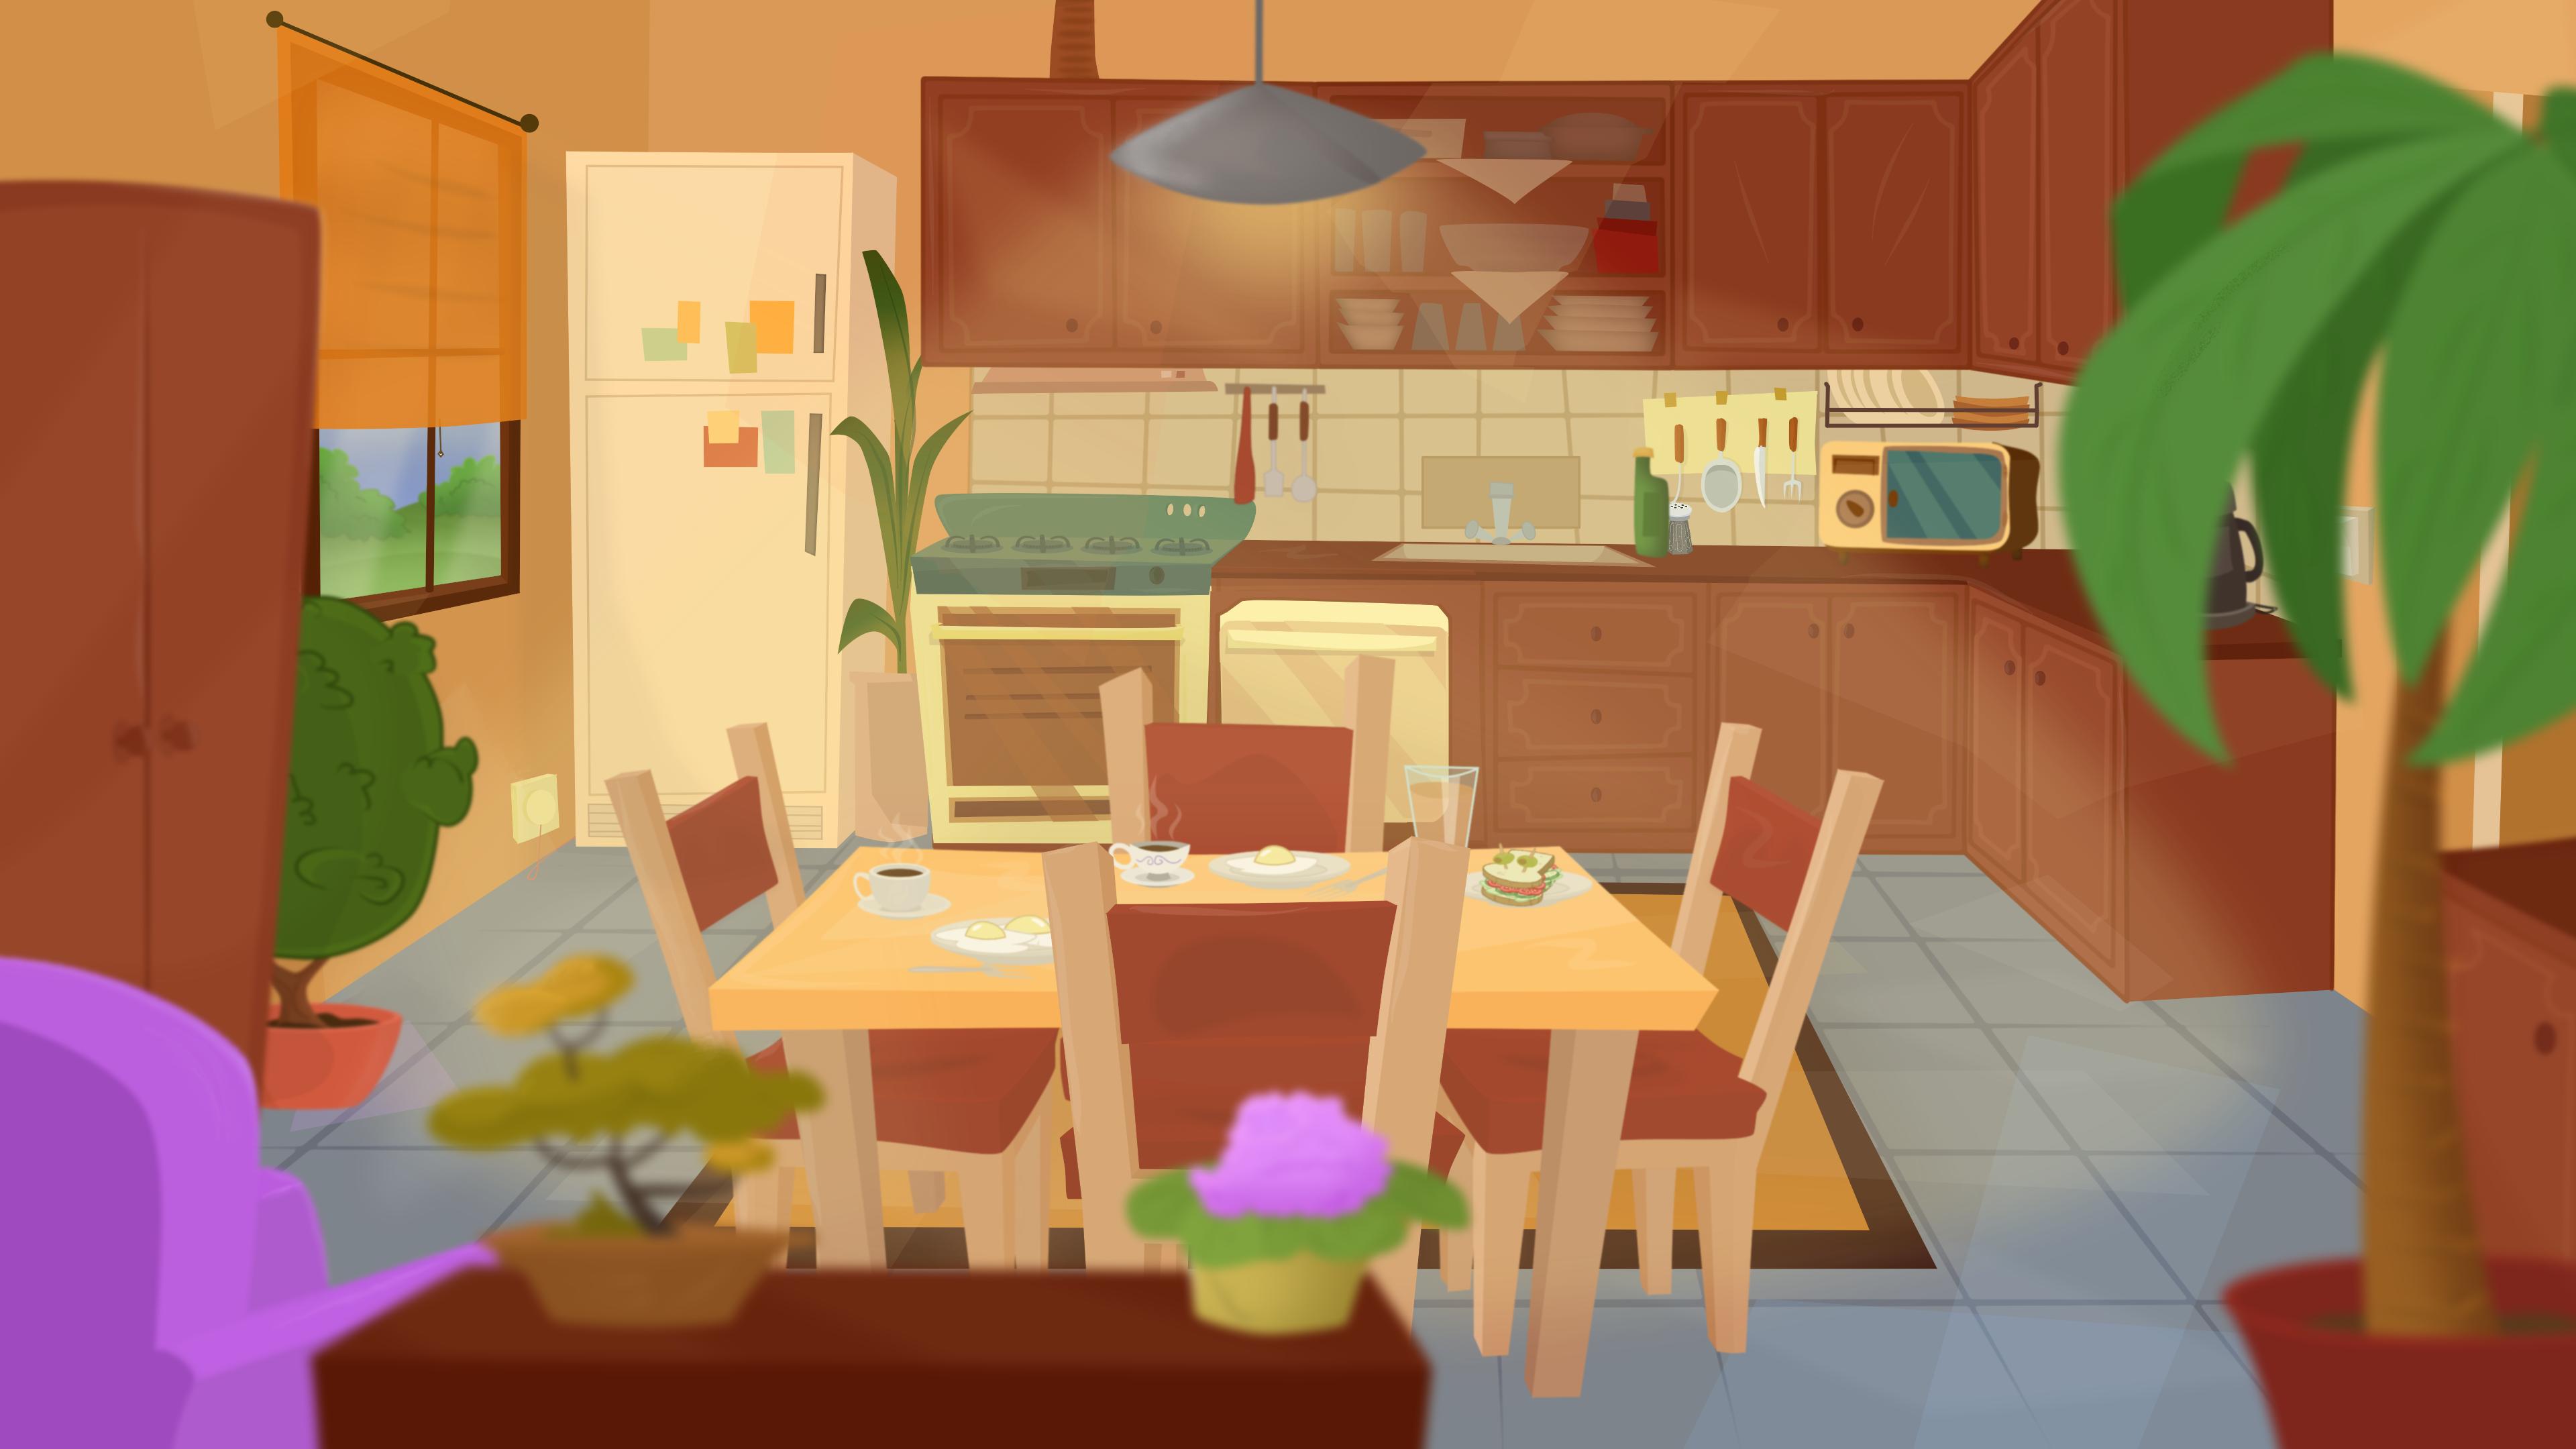 Cartoony Kitchen Illustration Illustration Family Guy Character